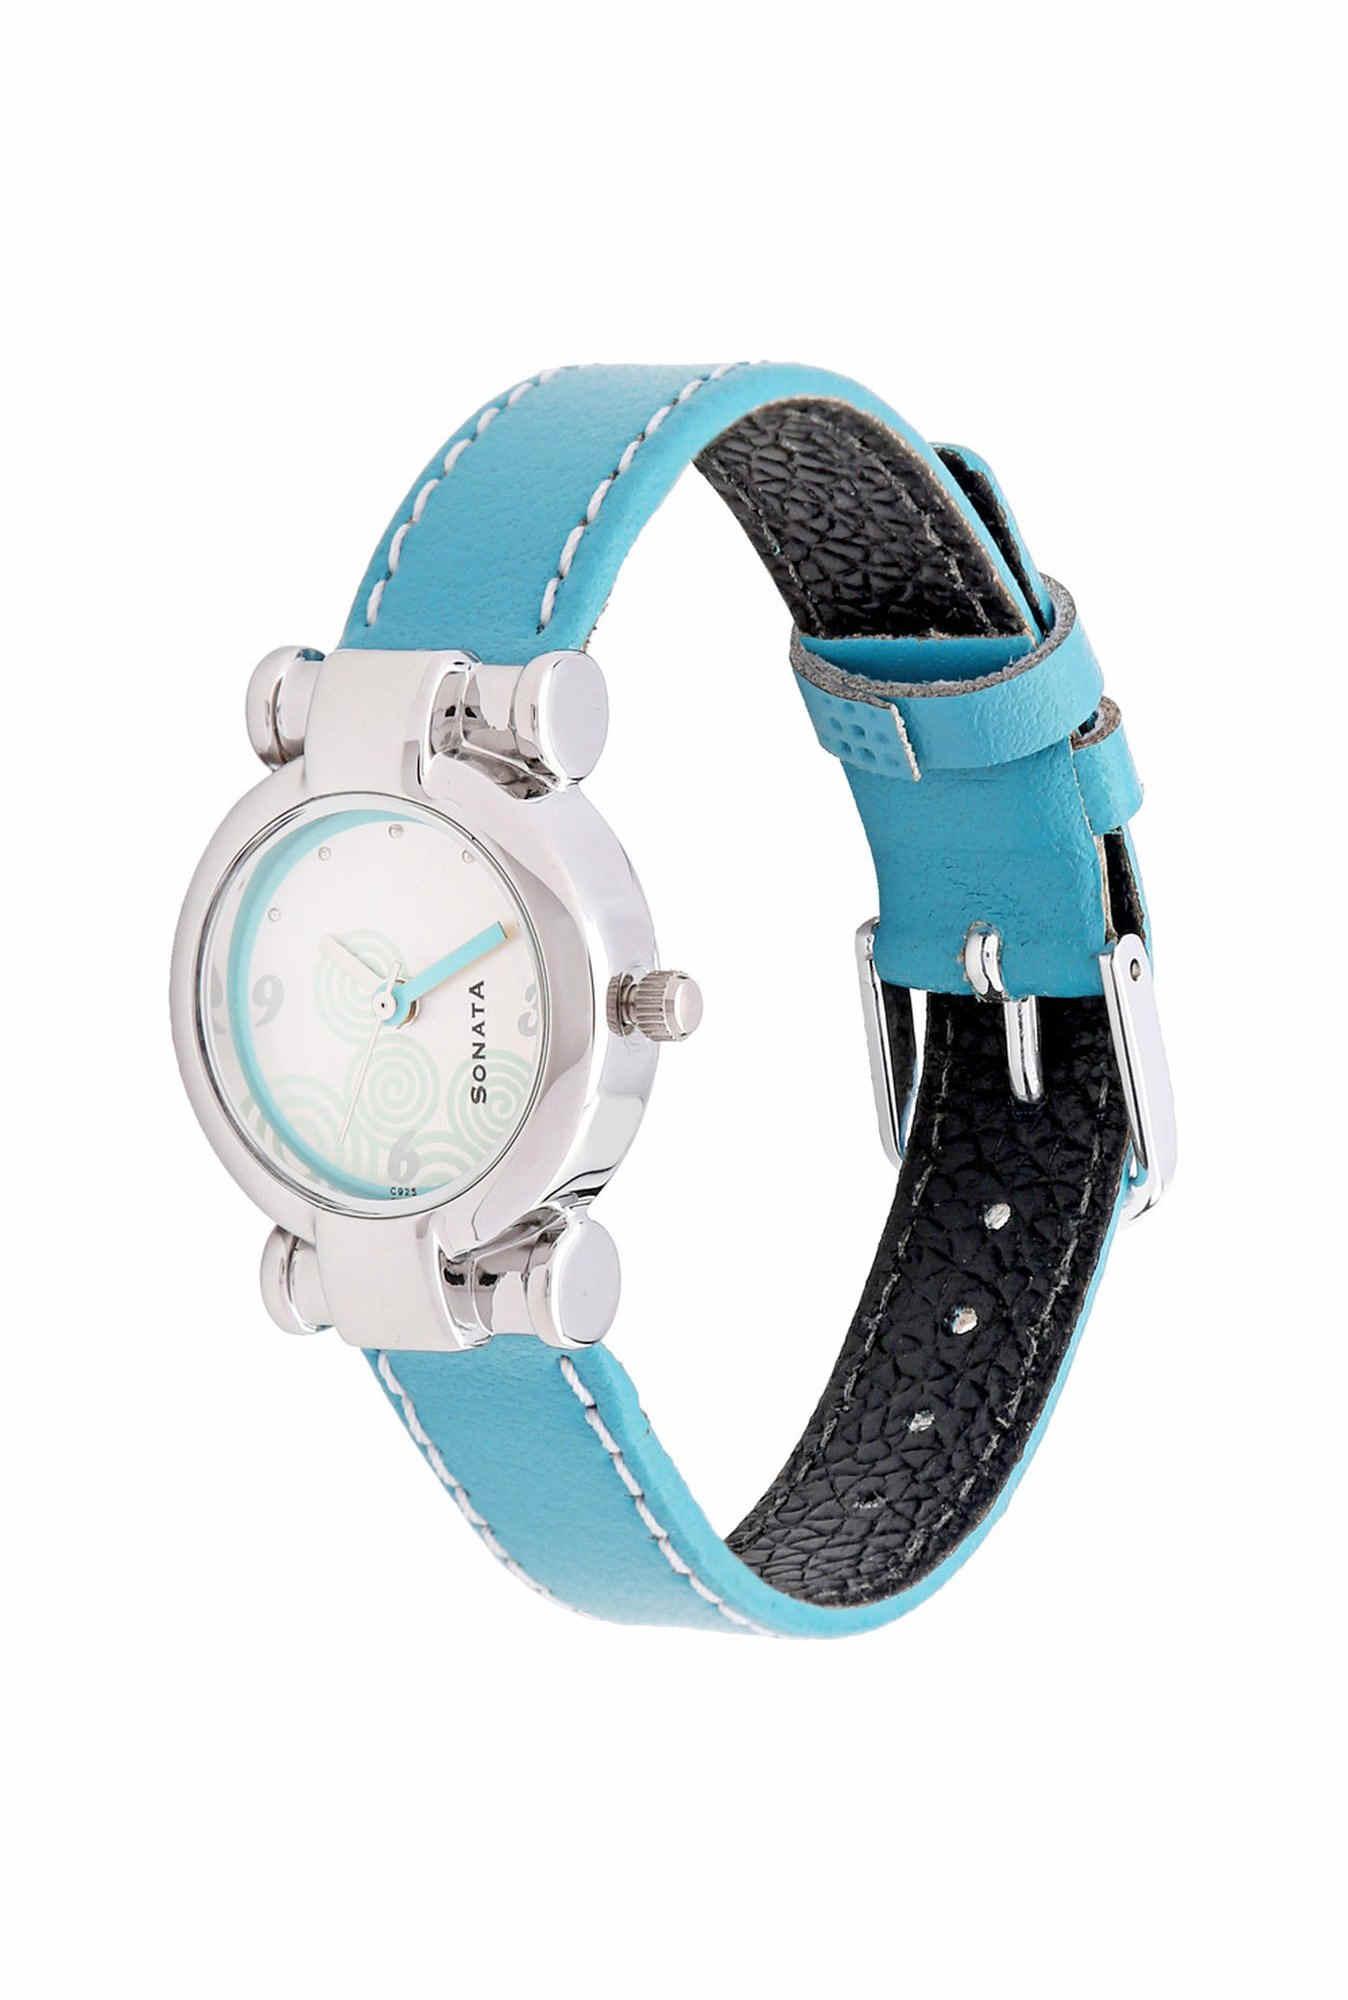 Sonata NF8944SL01CJ Yuva Analog White Dial Women's Watch (NF8944SL01CJ)